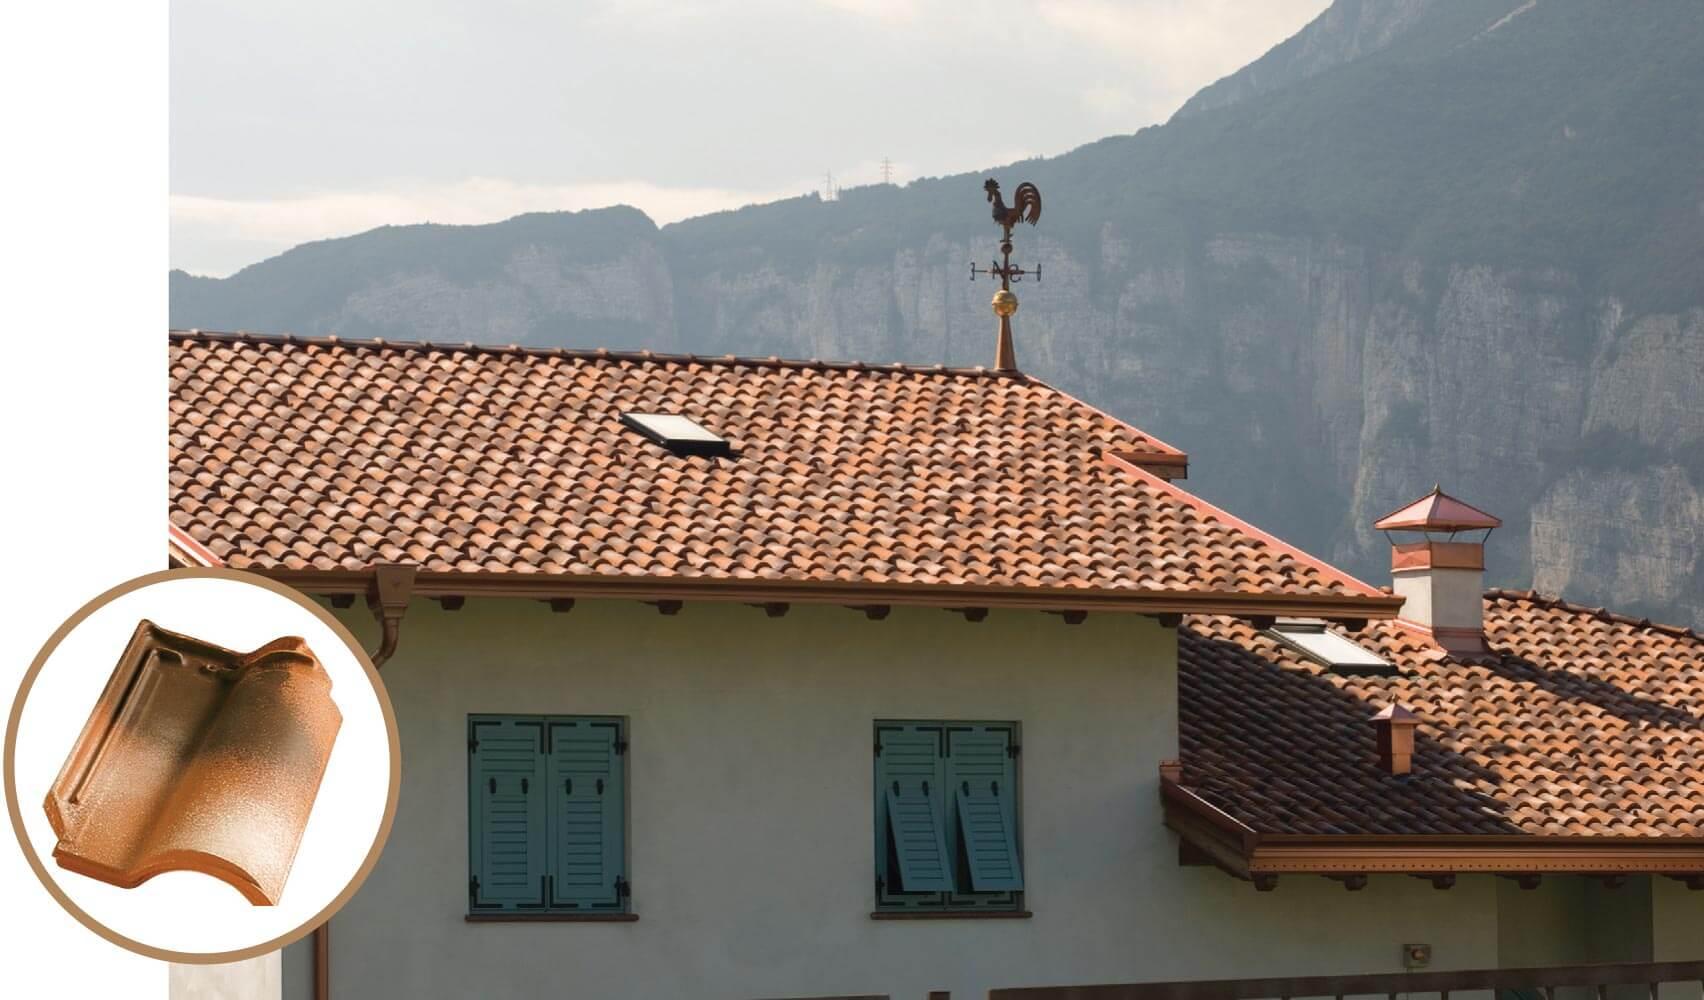 Dachówka firmy Tognana, Portugalka, kolor Neoclassic.